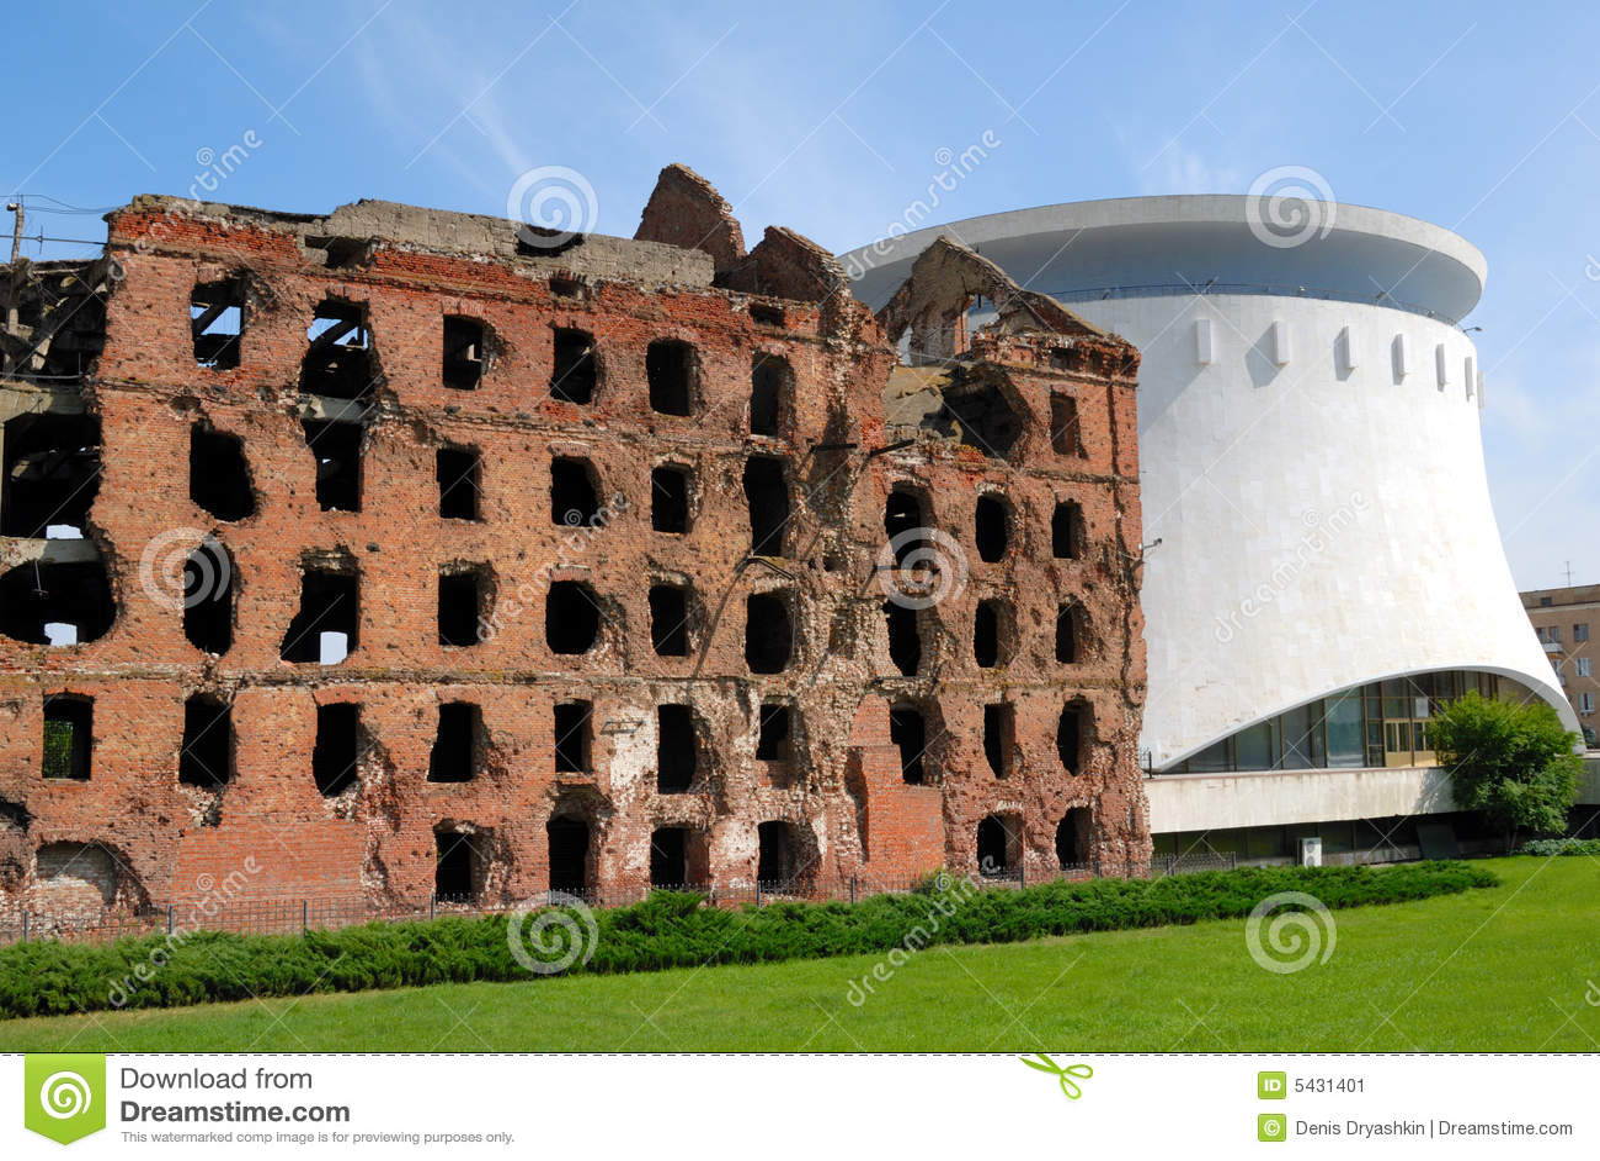 Molino destruido lucha Stalingrad de Stalingrad del panorama del museo